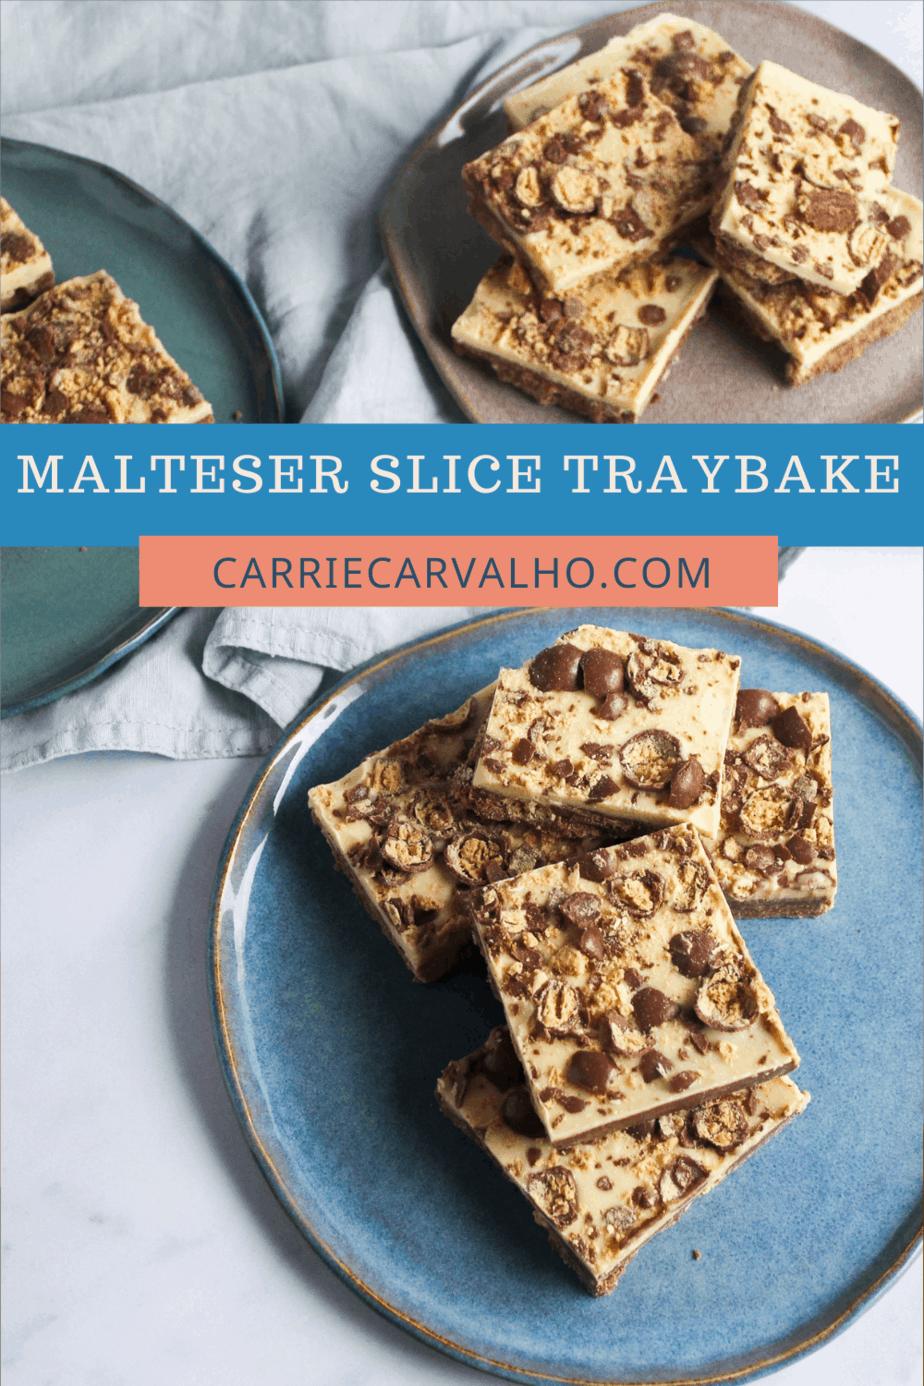 Malteser Slice Traybake - Easy No-Bake Treat